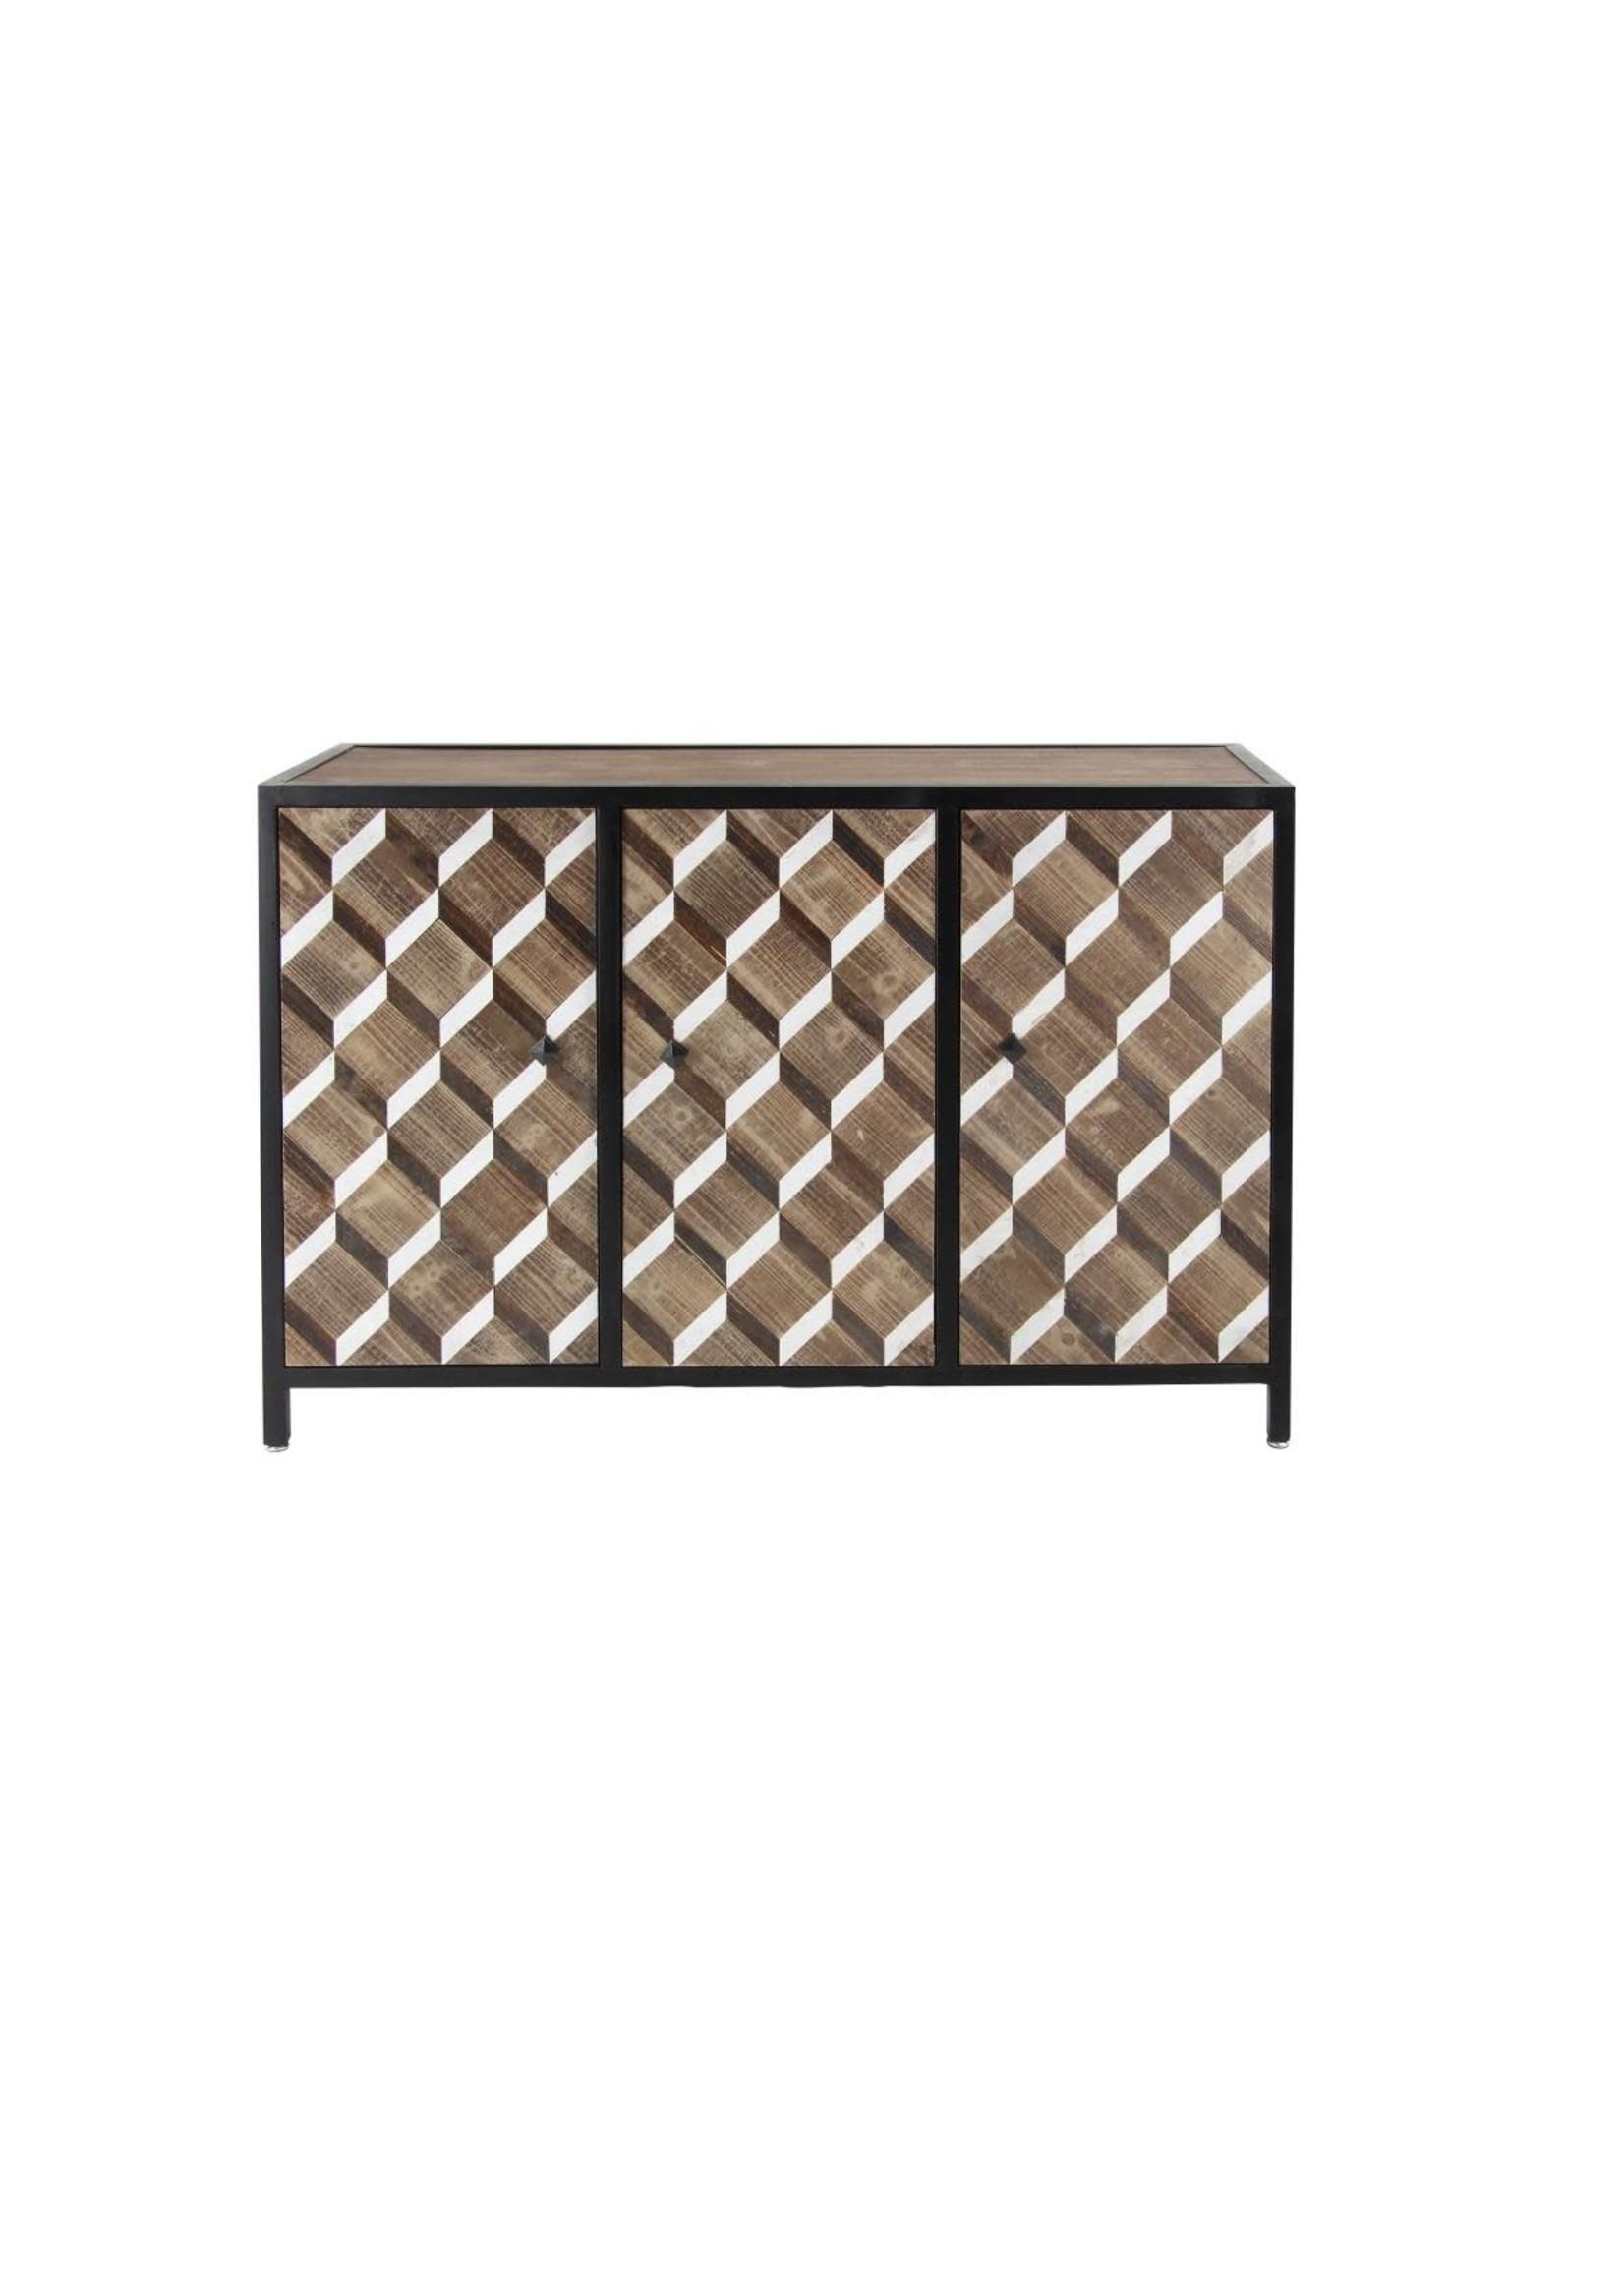 UMA Enterprises Wood Metal Cabinet